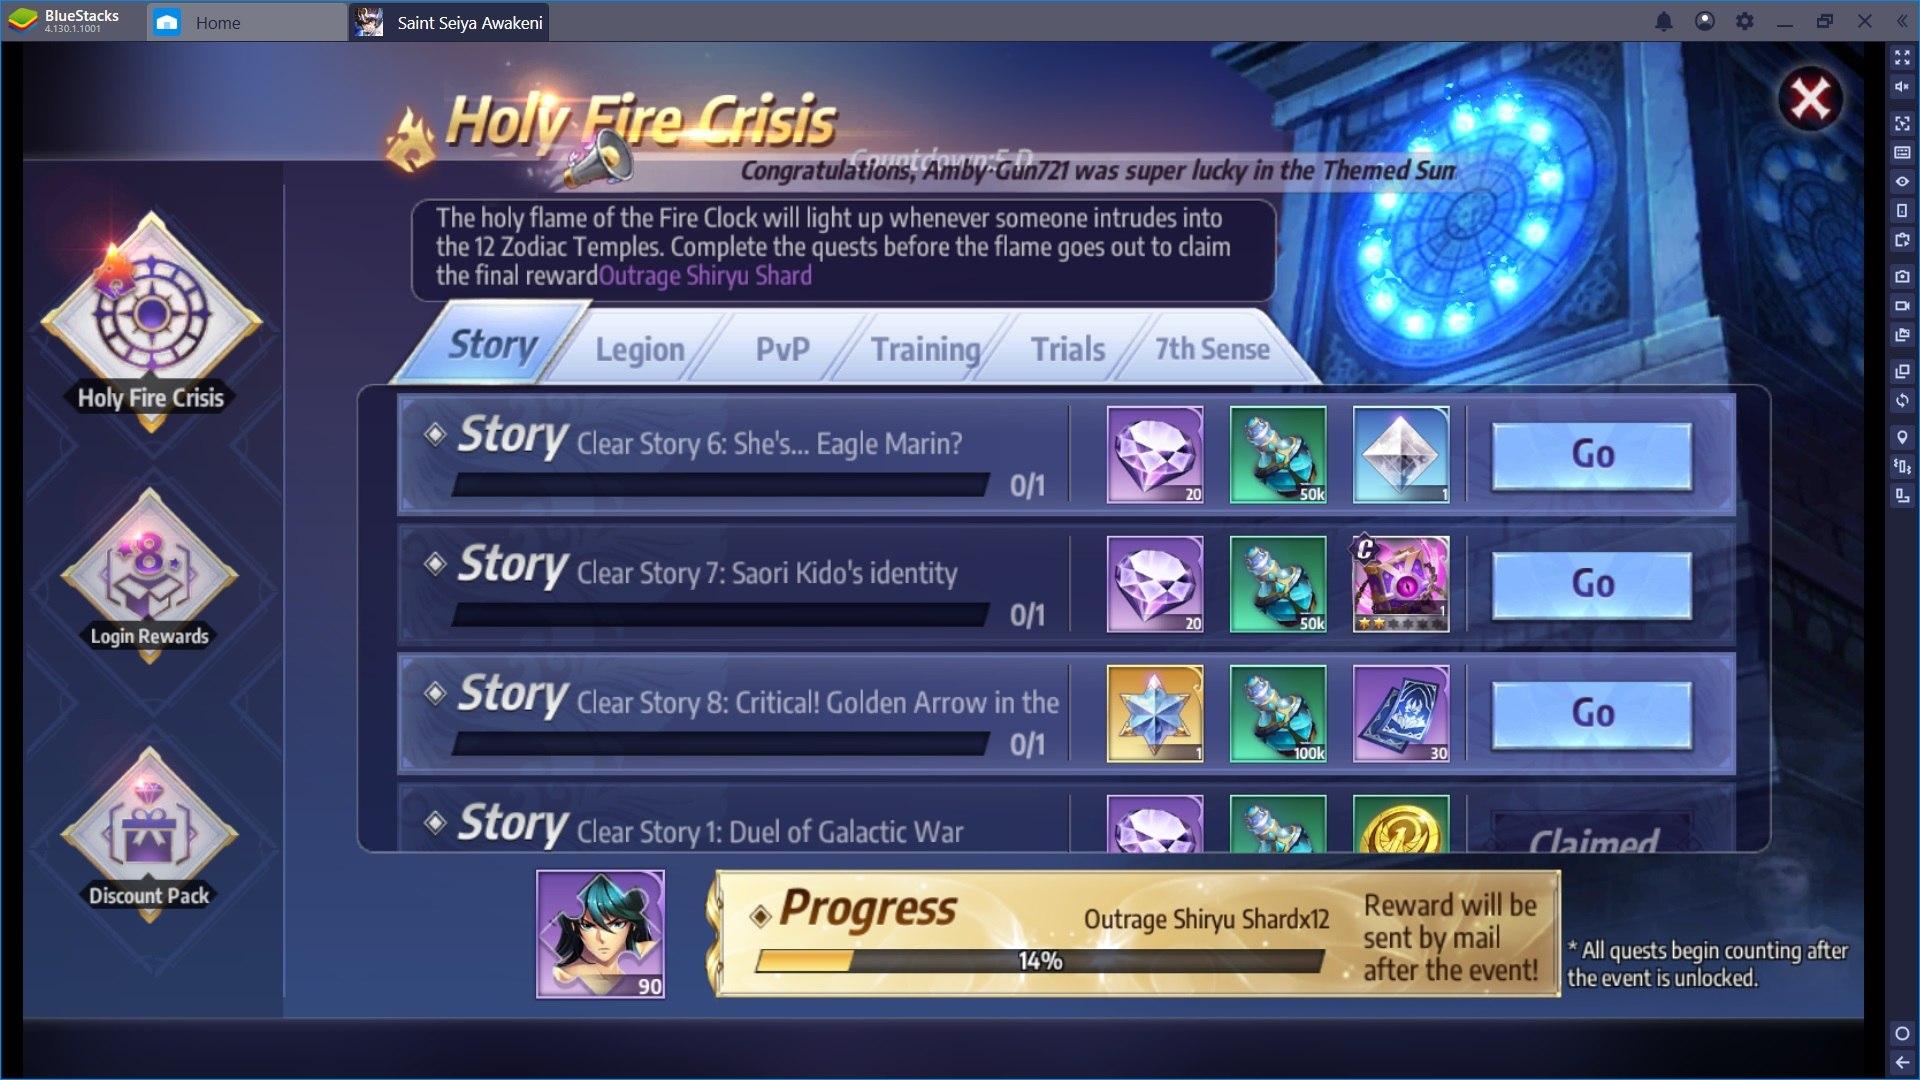 I Migliori Consigli per Saint Seiya Awakening